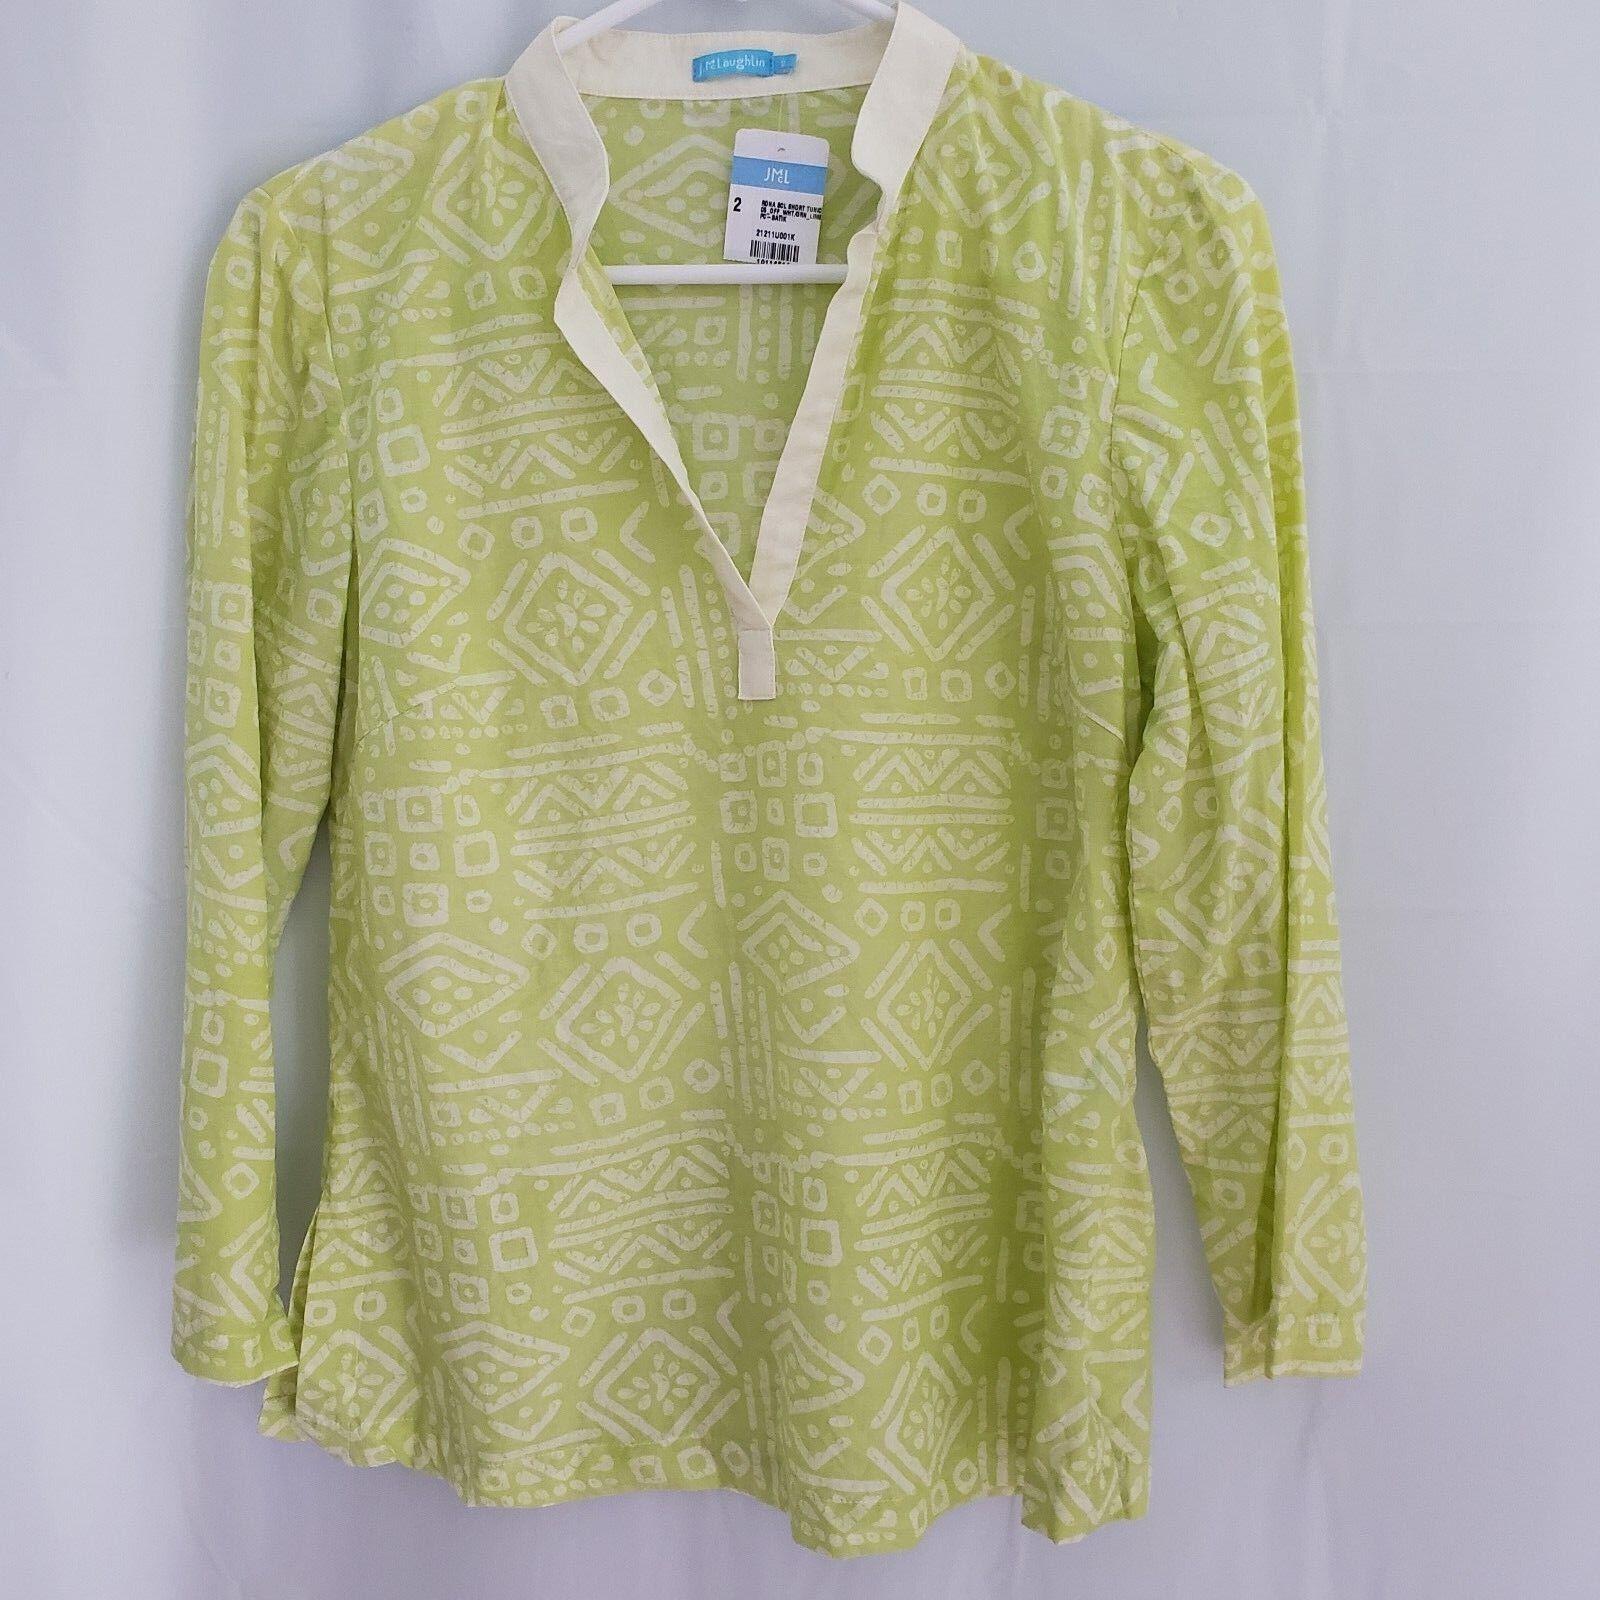 J MCLAUGHLIN Größe 2 Lime Grün Weiß Tunic Blouse Silk Cotton Blend New w Tags